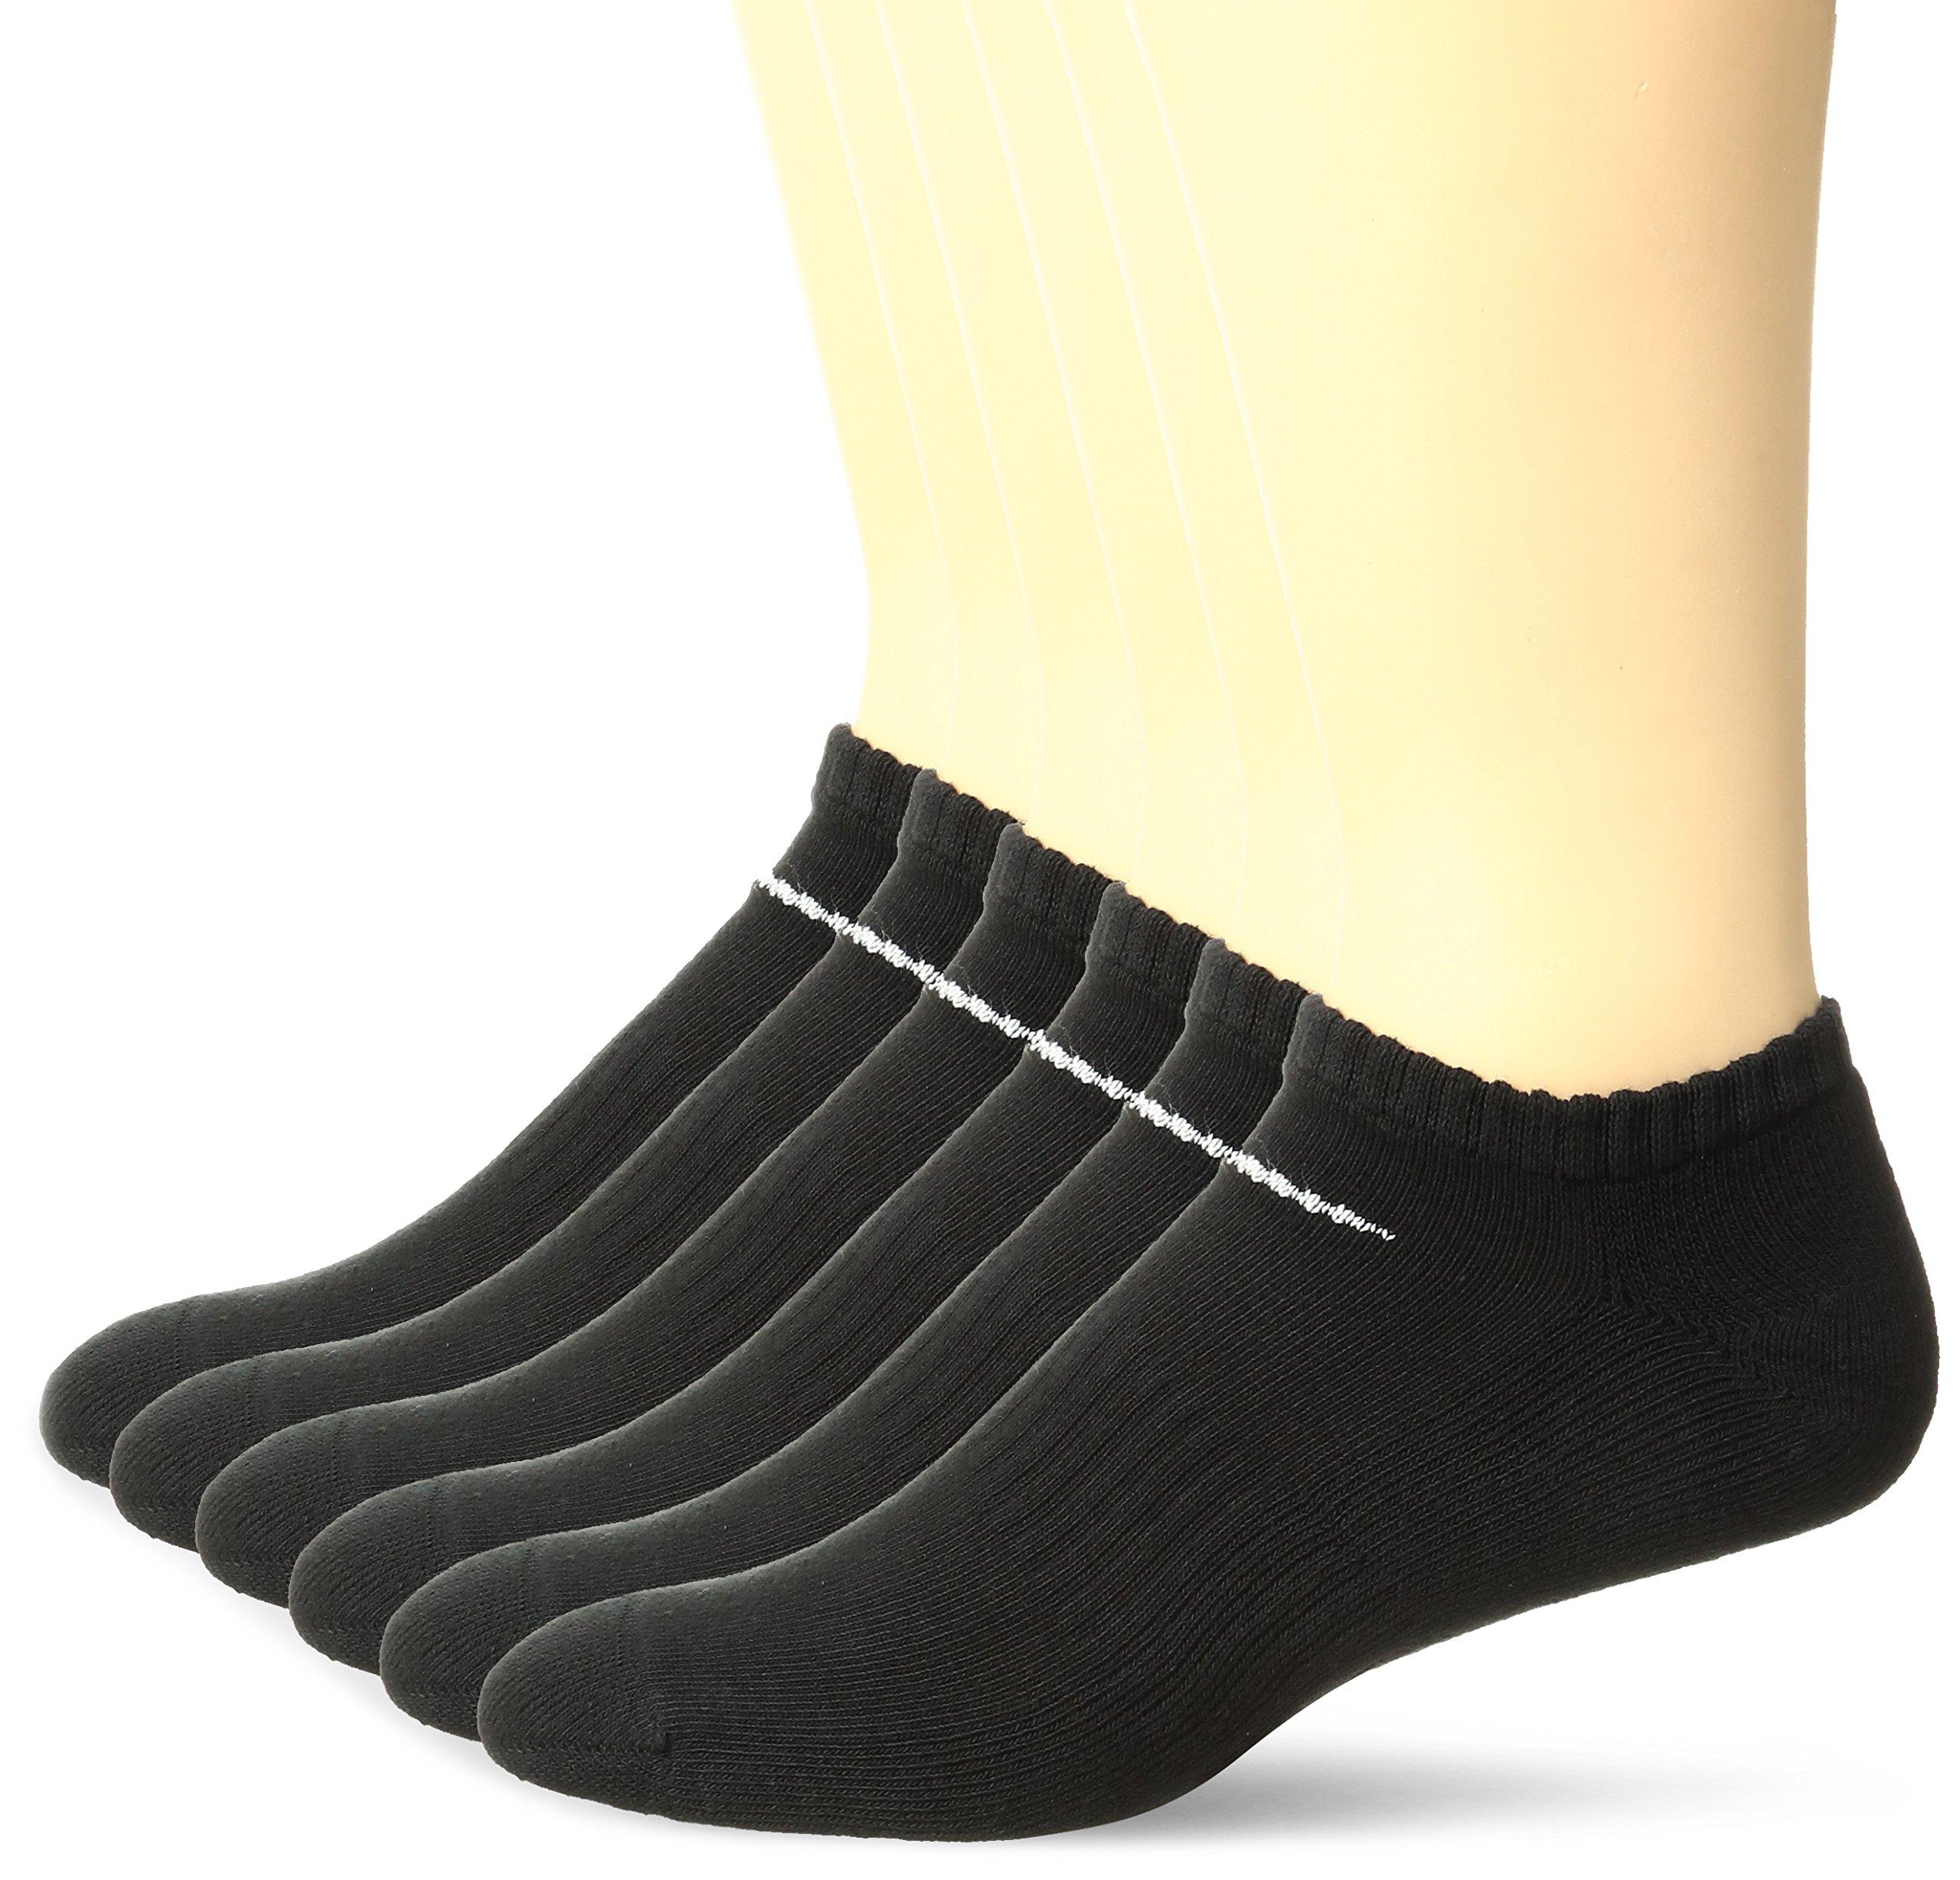 NIKE Unisex Performance Cushion No-Show Socks with Bag (6 Pairs), Black/White, Medium by Nike